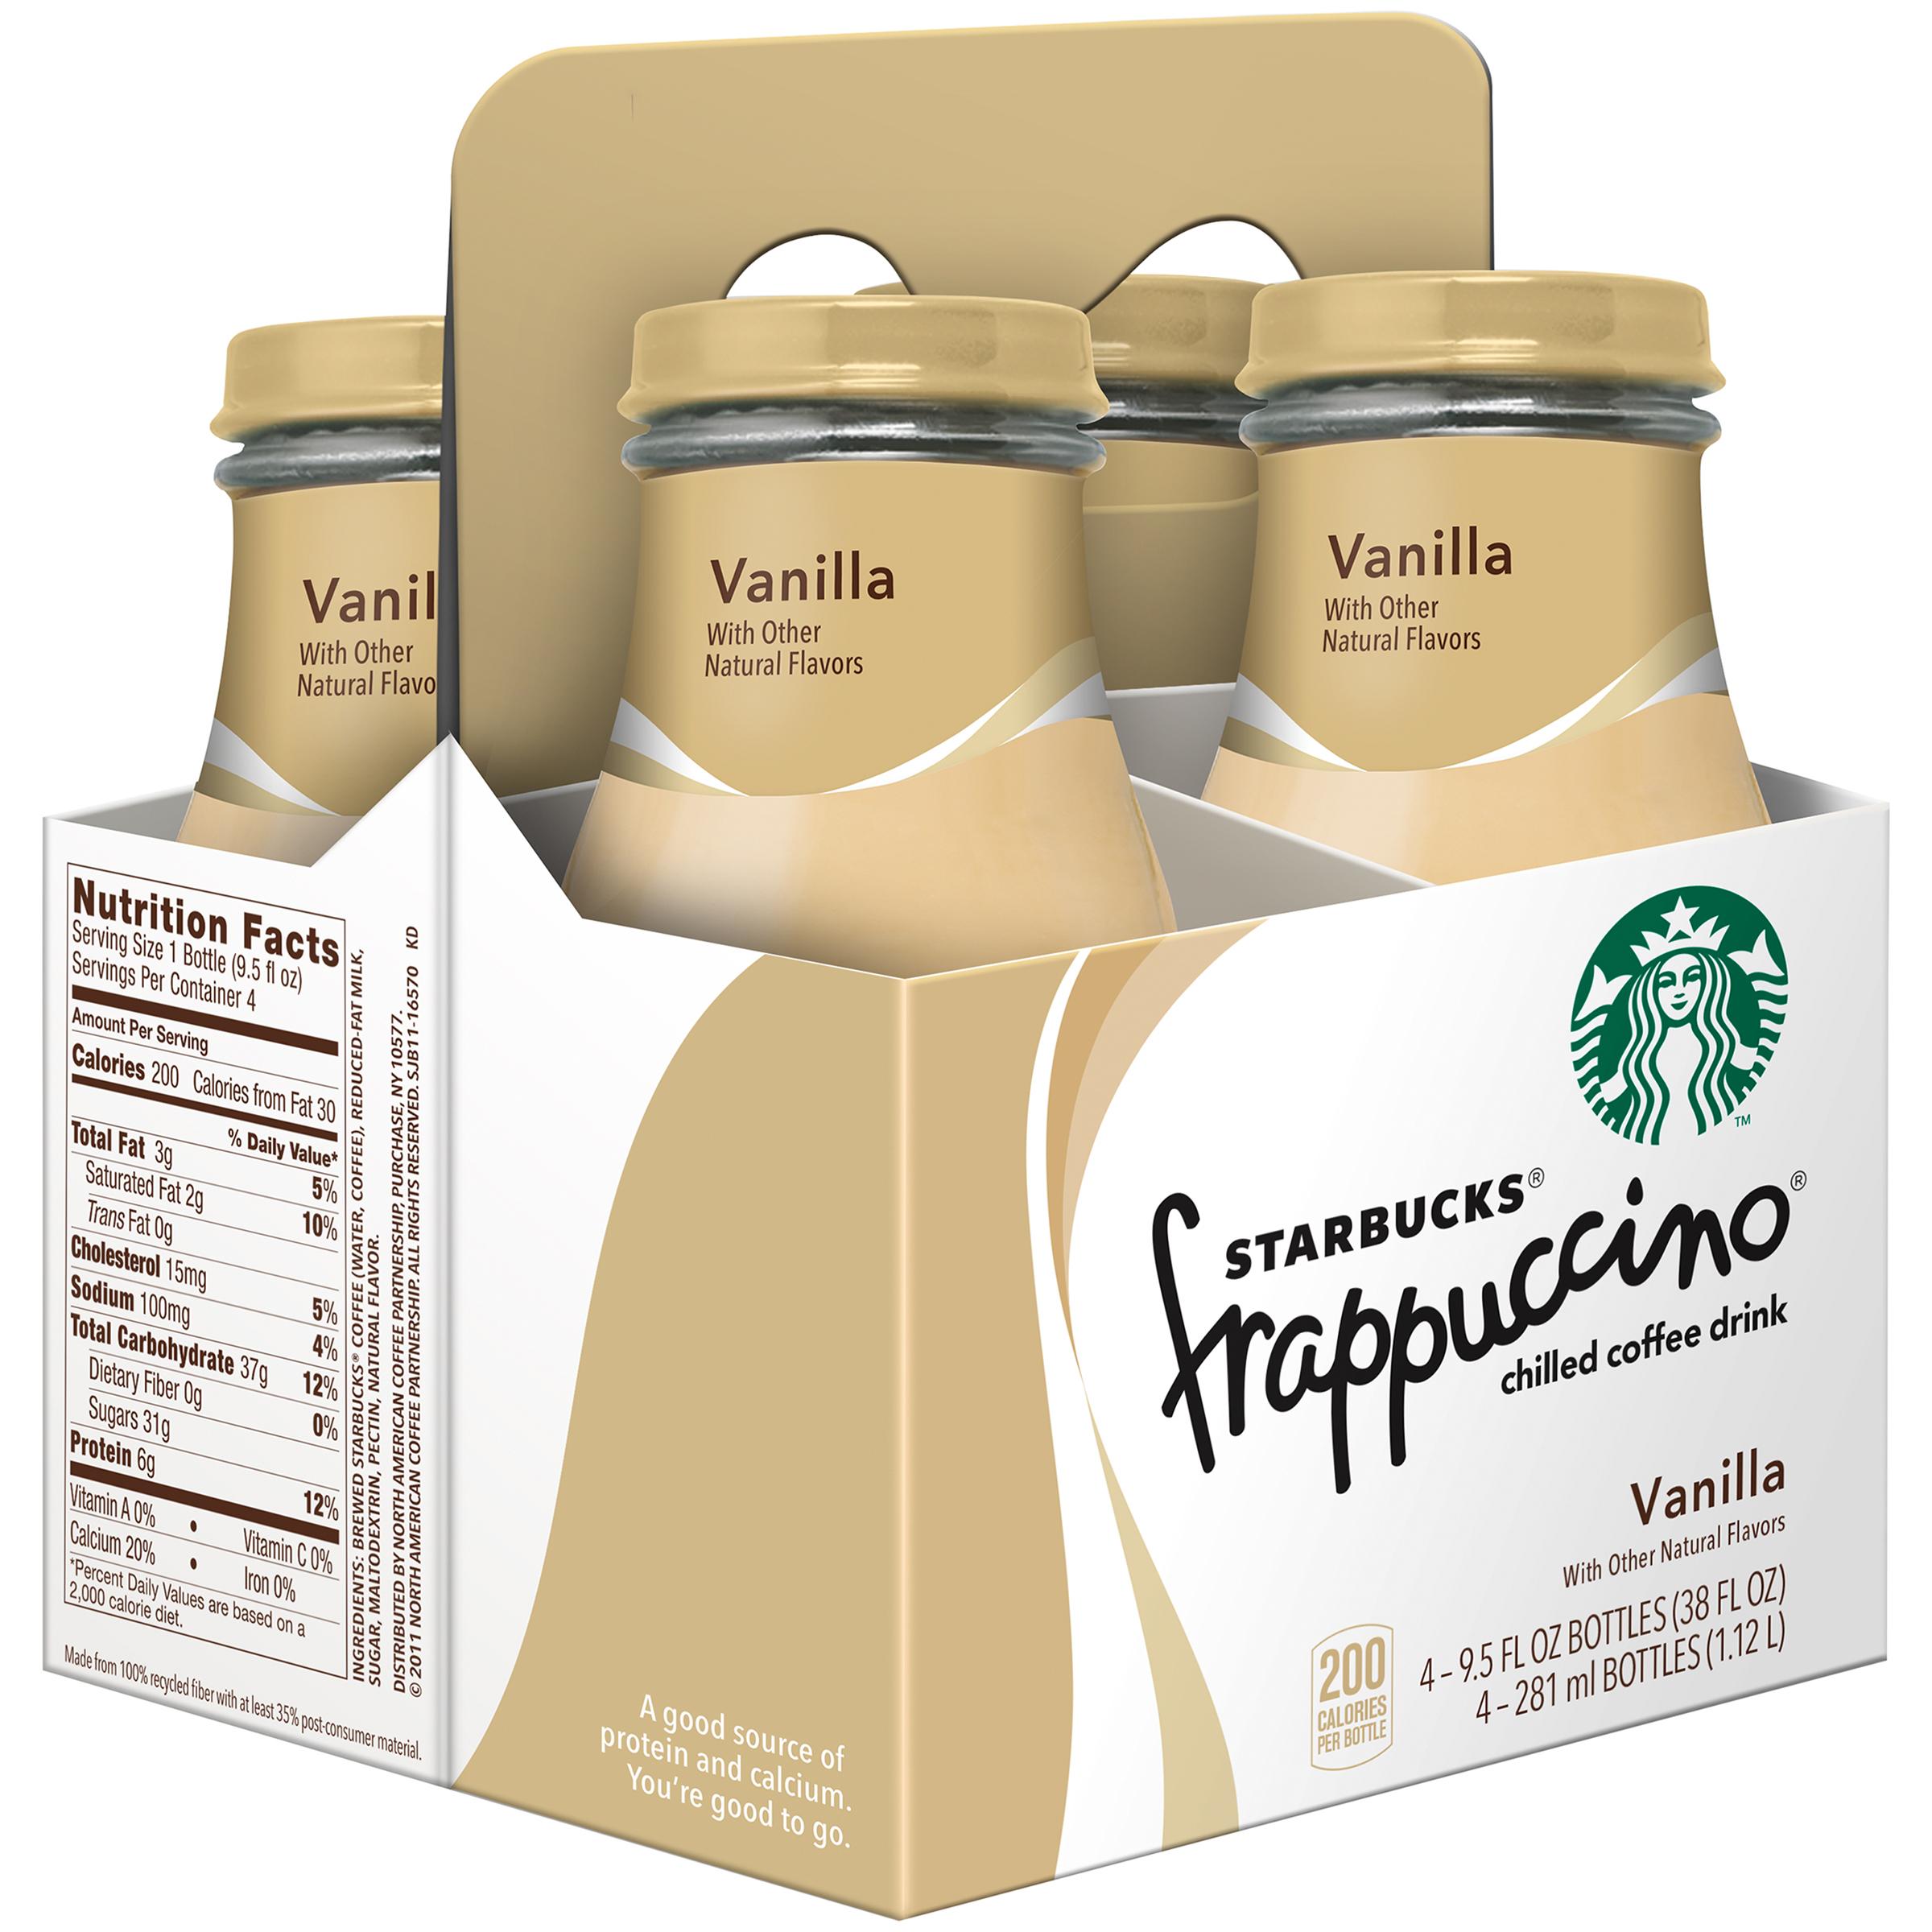 Starbucks Frappuccino Coffee Drink Vanilla 4 95 Fl Oz